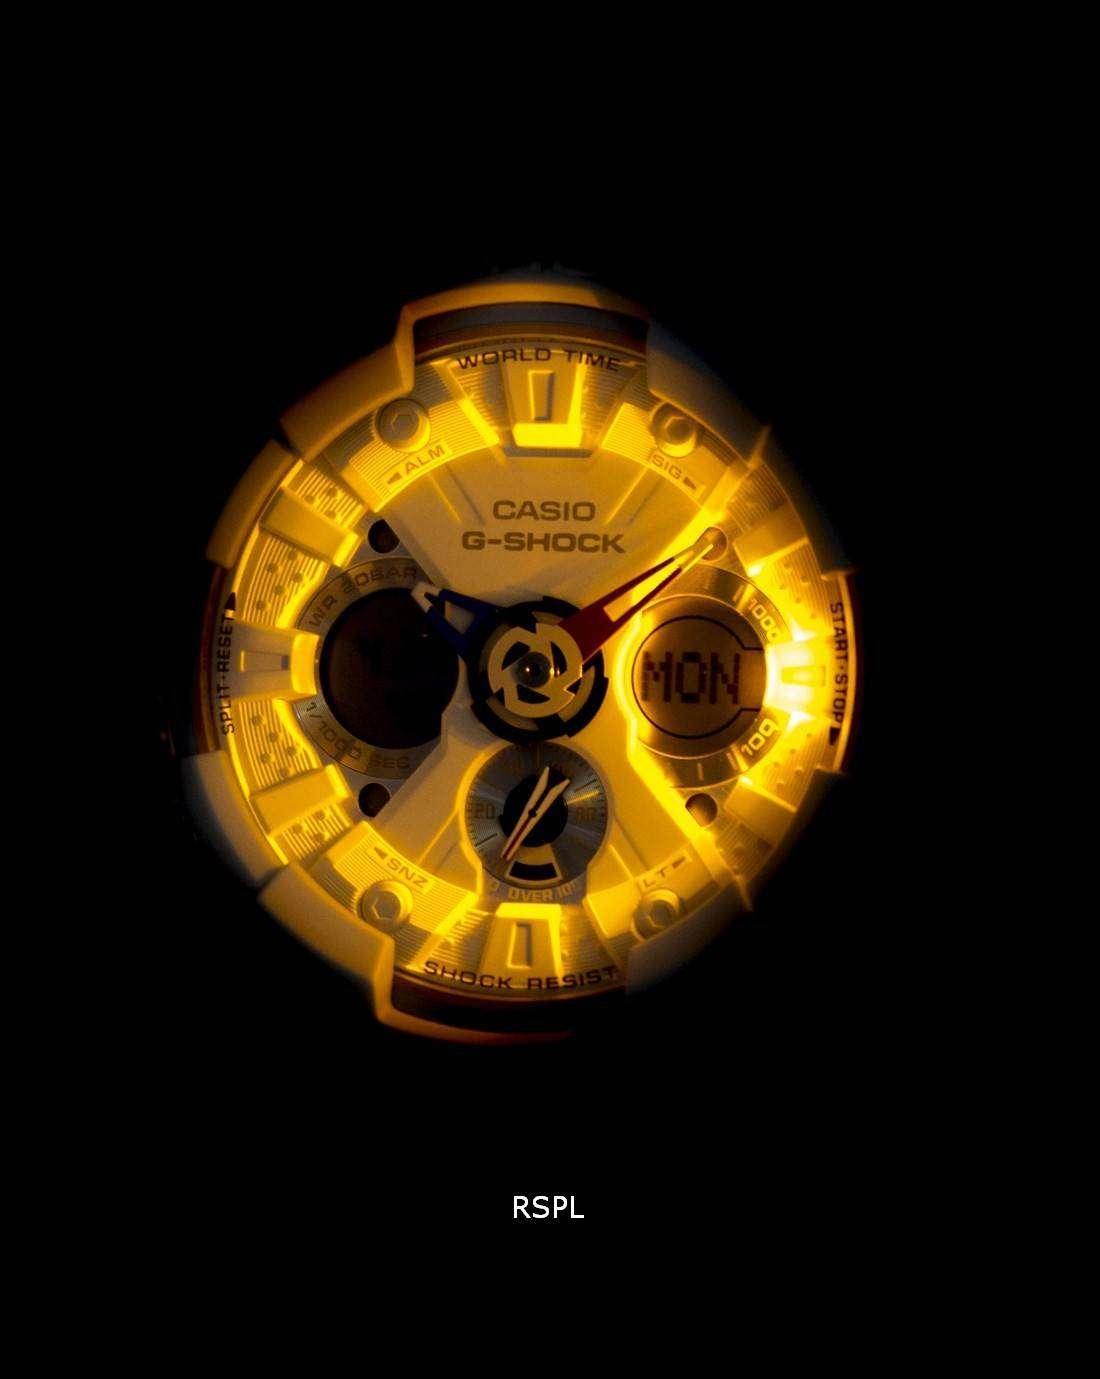 Casio G Shock Ga 120trm 7a White Mens Watch Daftar Harga Terkini 201tr 7adr Jam Tangan Pria Resin Analog Digital World Time Alarm